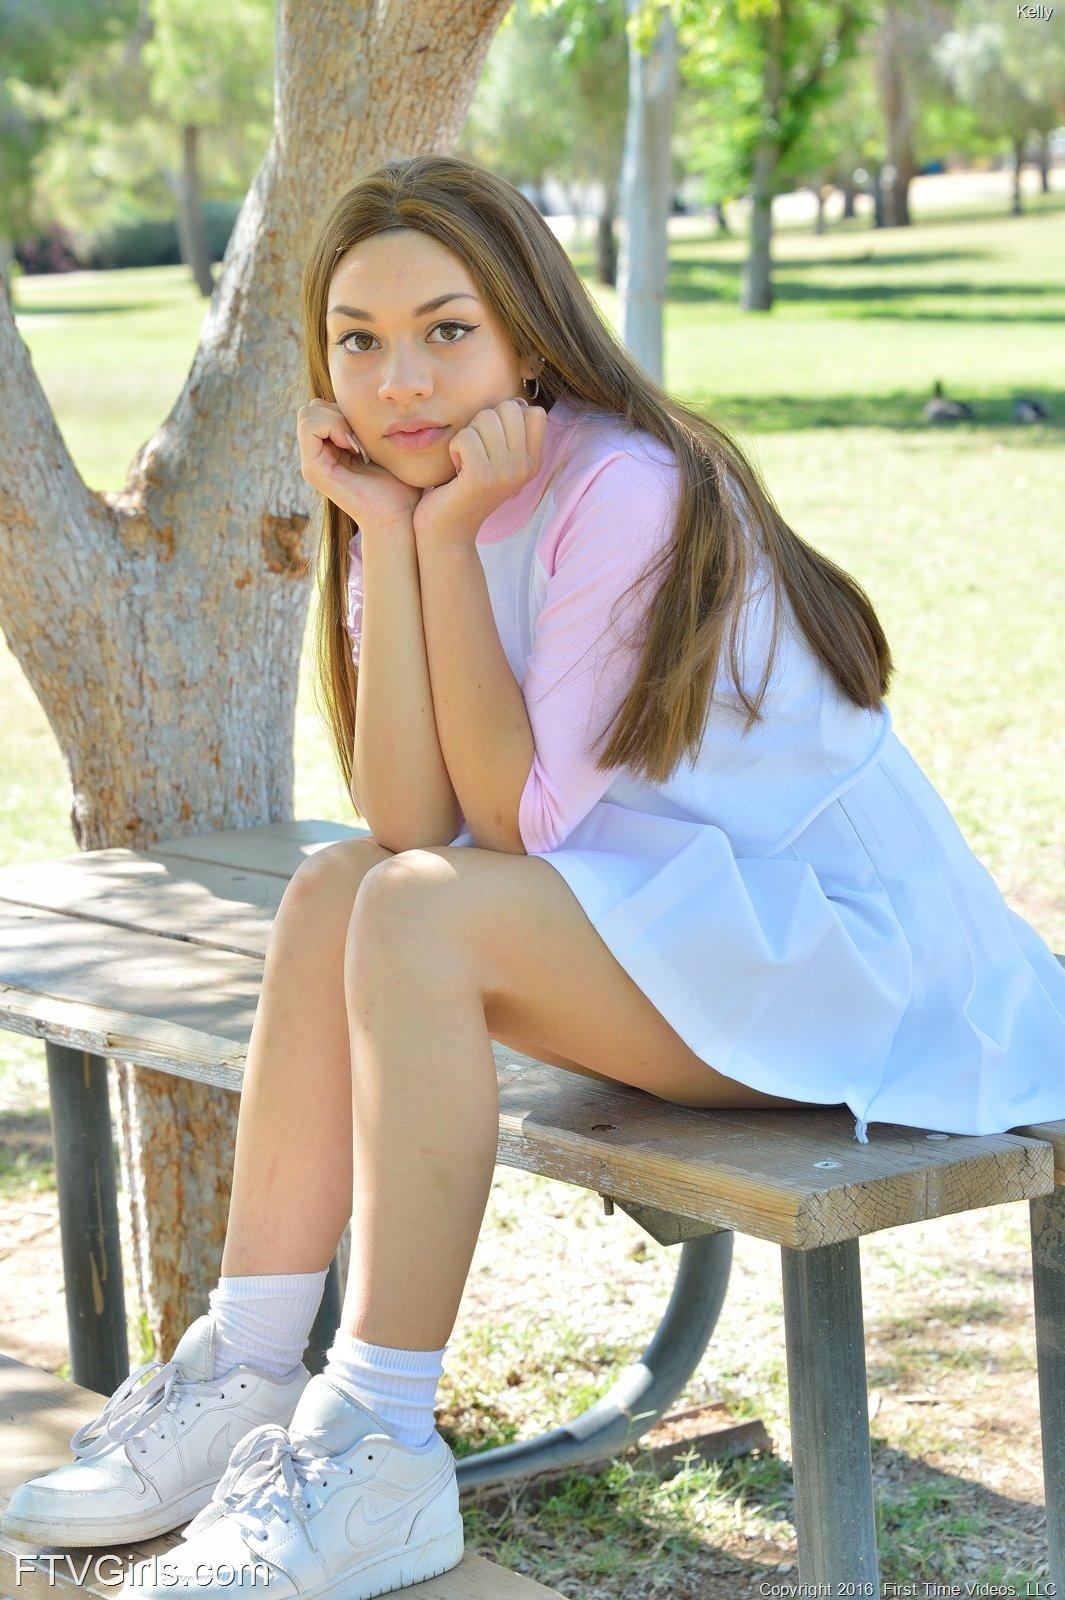 Kelly Kitten In Schoolgirl Views By Ftv Girls 16 Photos -3247